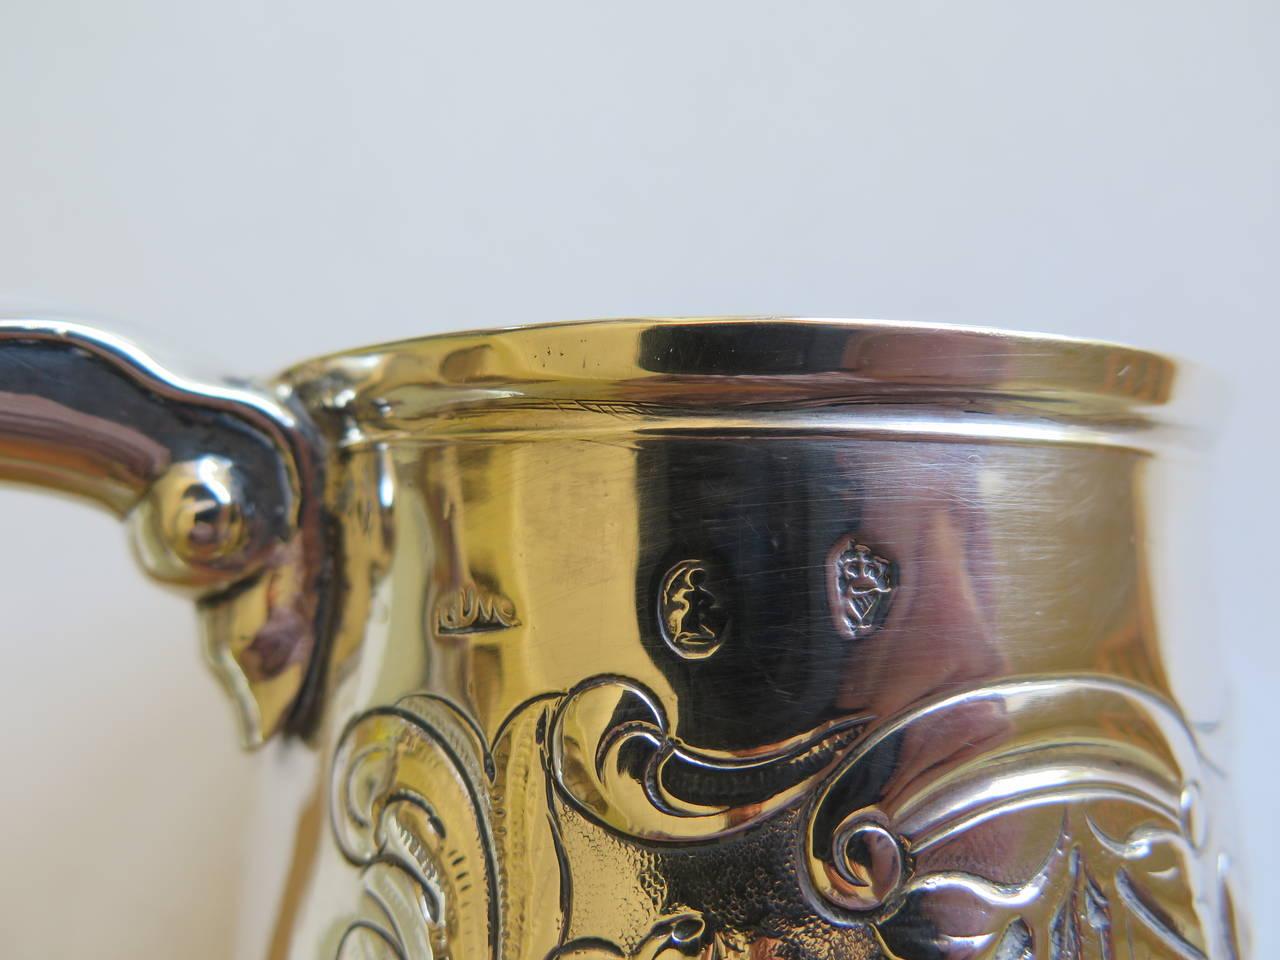 Rare Irish George II Silver Mug or Tankard by John Moore, Dublin 1740 5